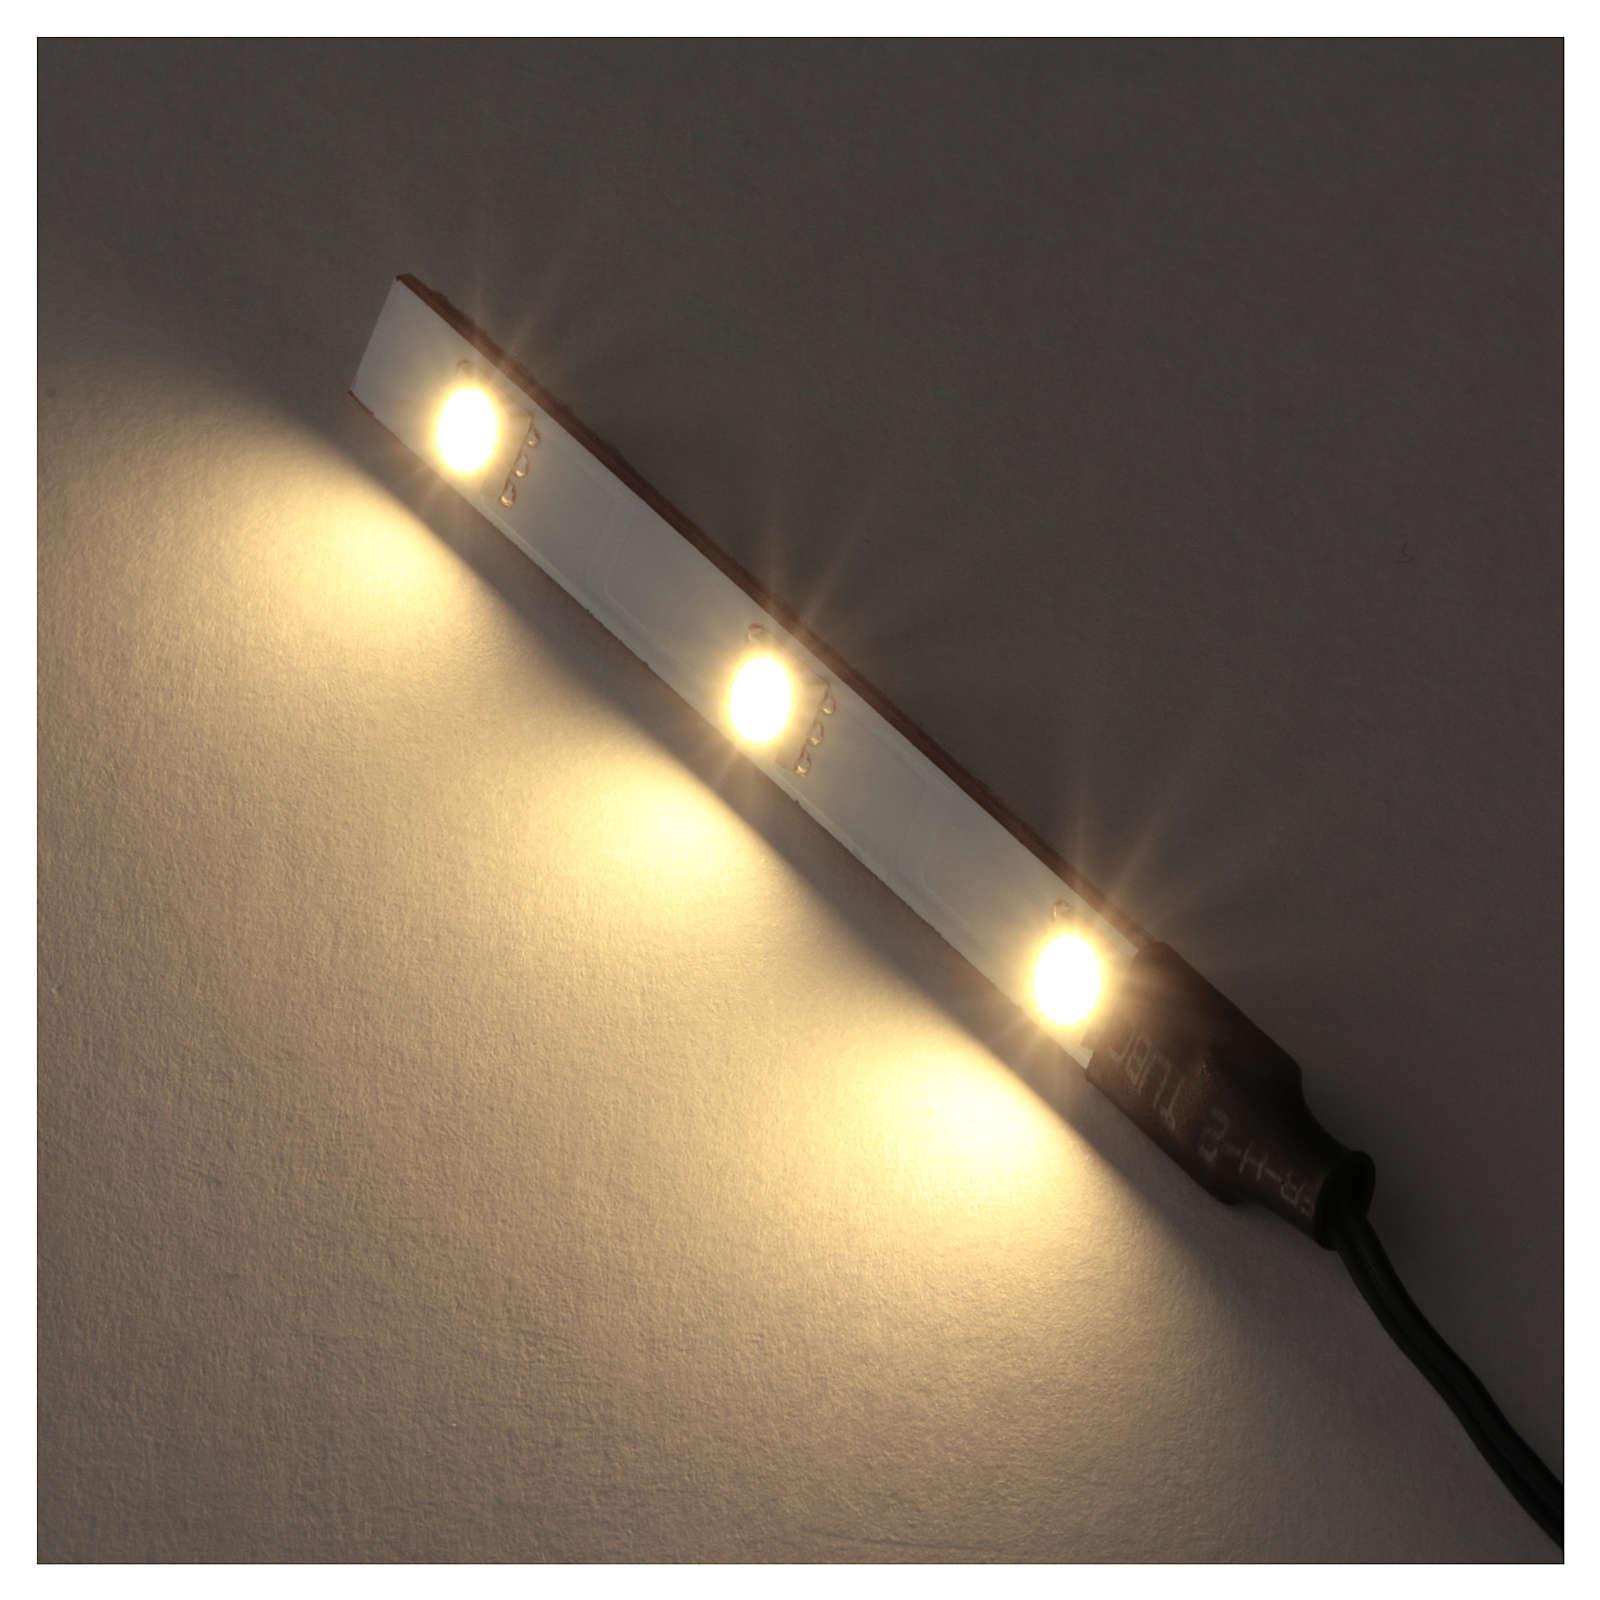 White LED flat triple low voltage 4